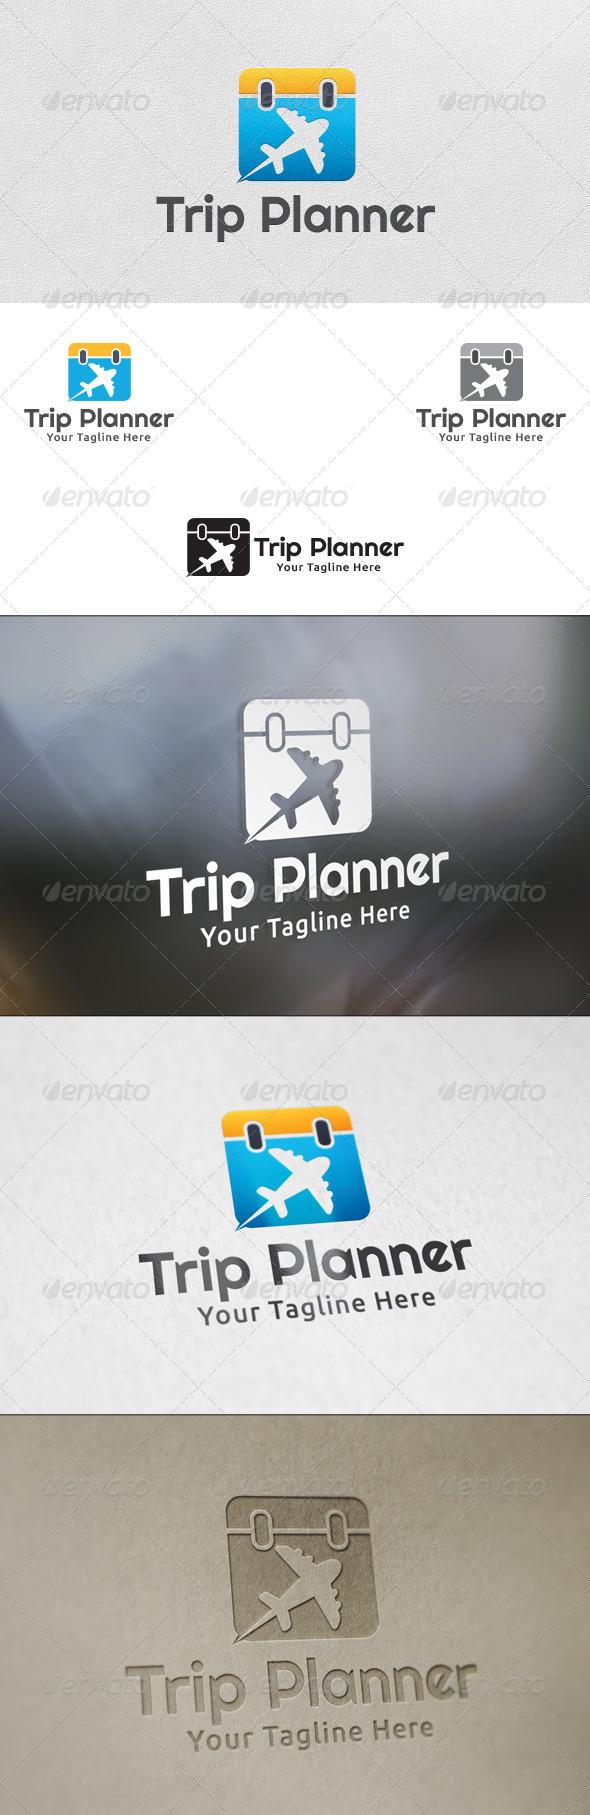 Trip Planner - Logo Template - Symbols Logo Templates